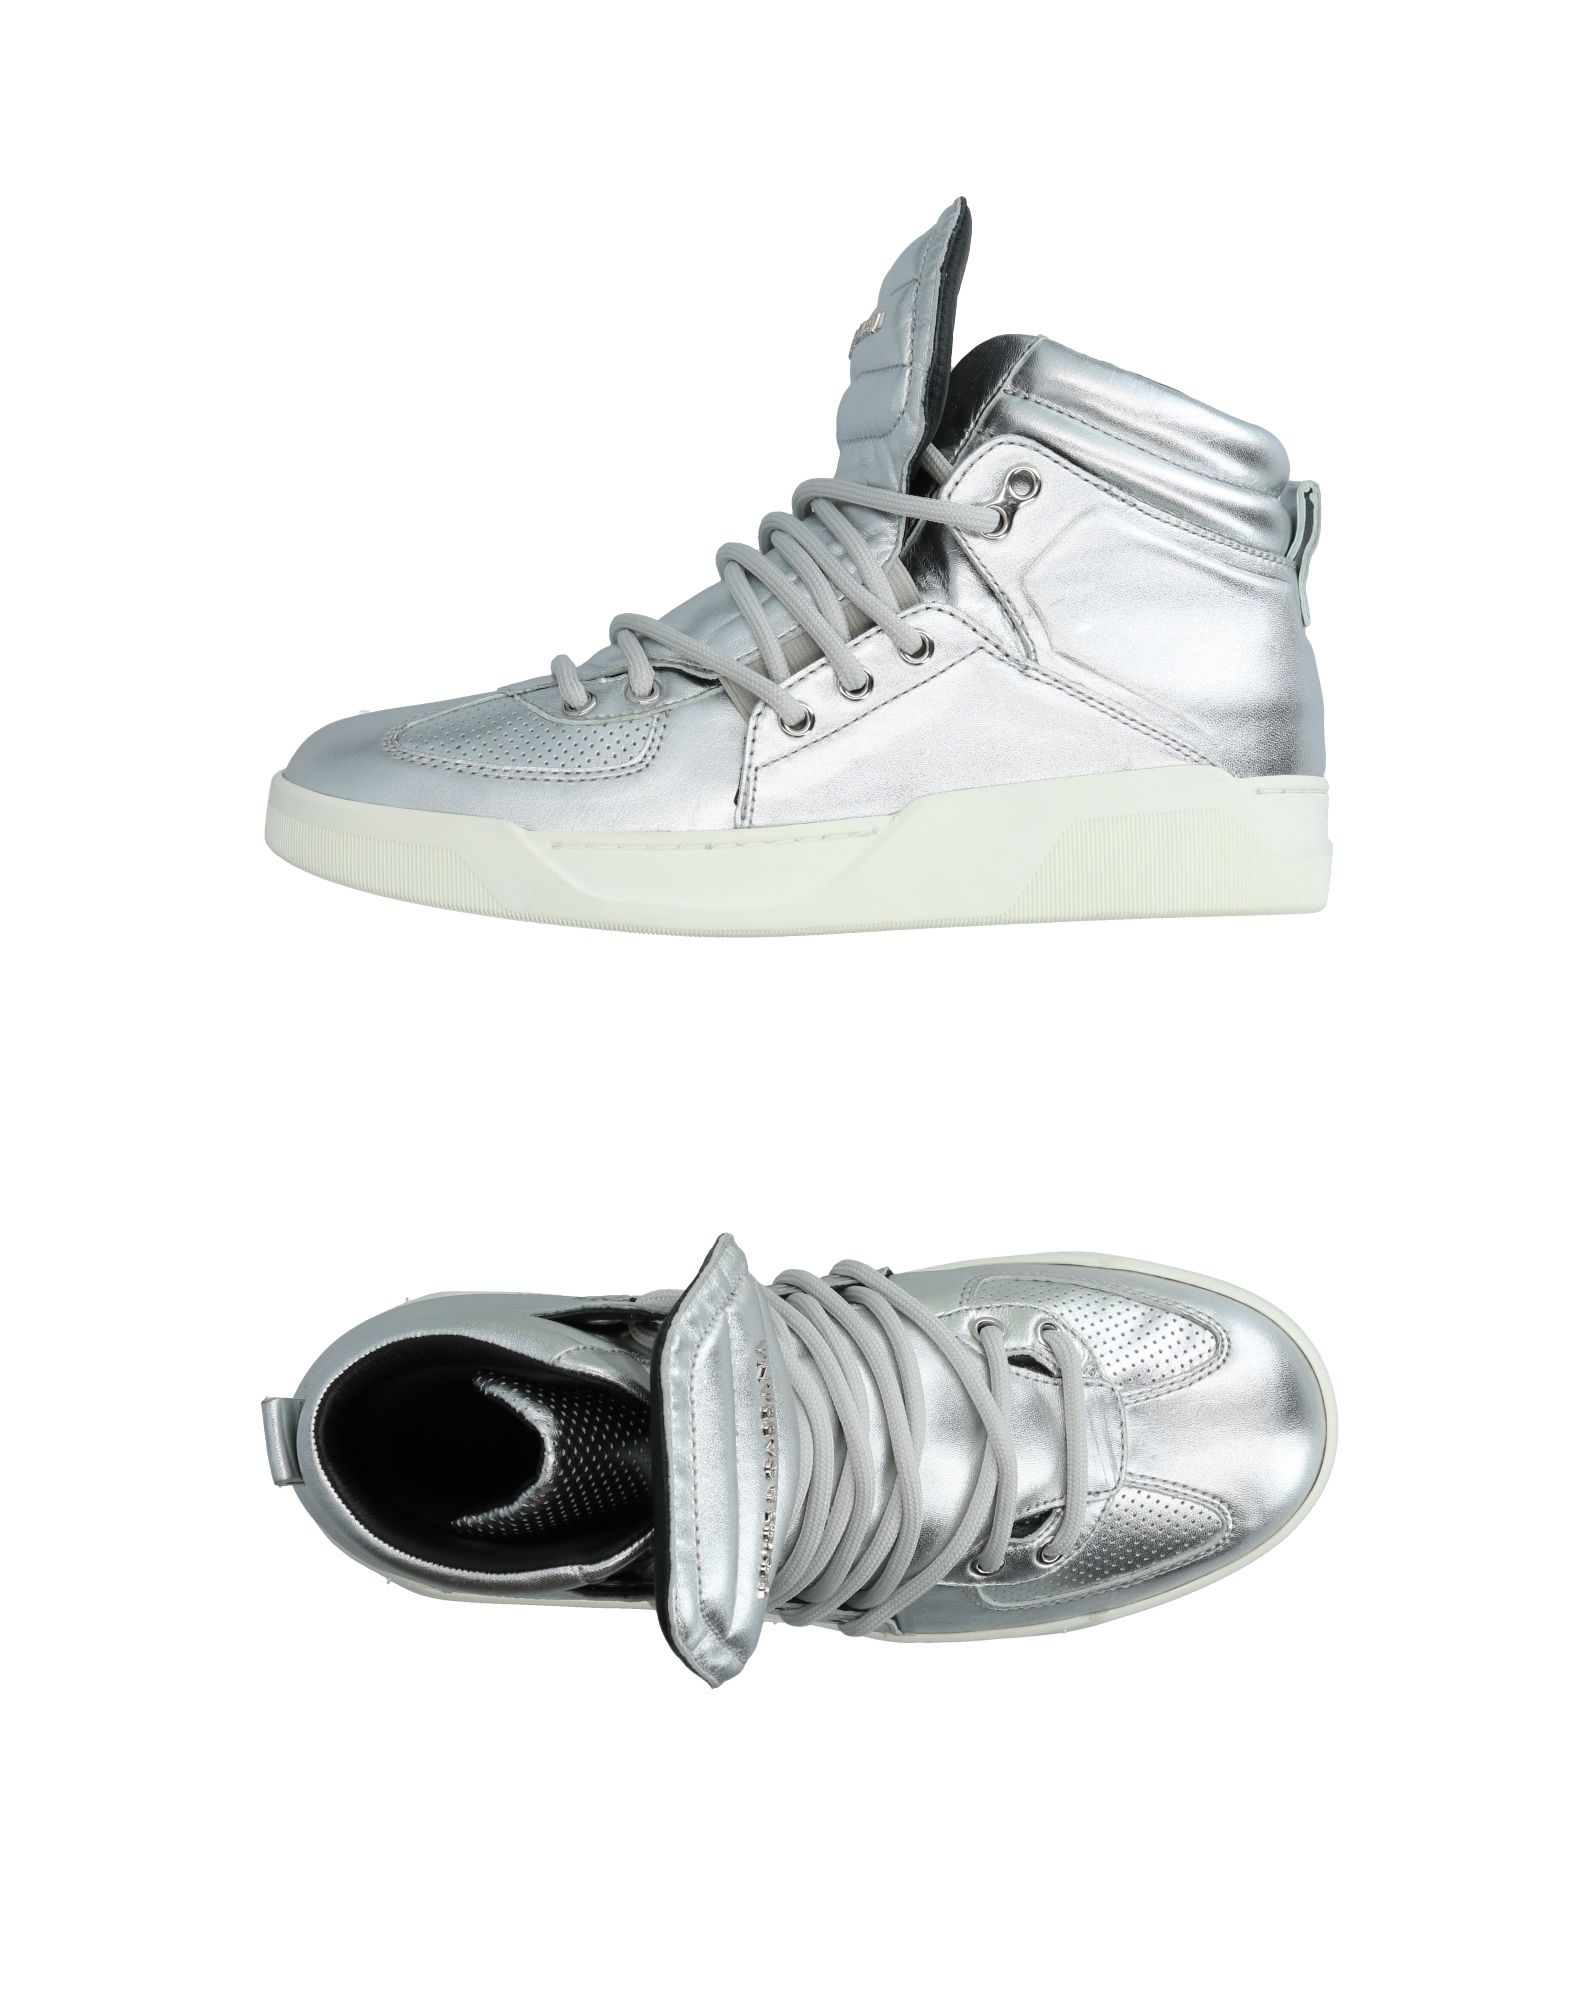 Dolce & Gabbana Sneakers Neue Herren  11232690BD Neue Sneakers Schuhe 20a8d4